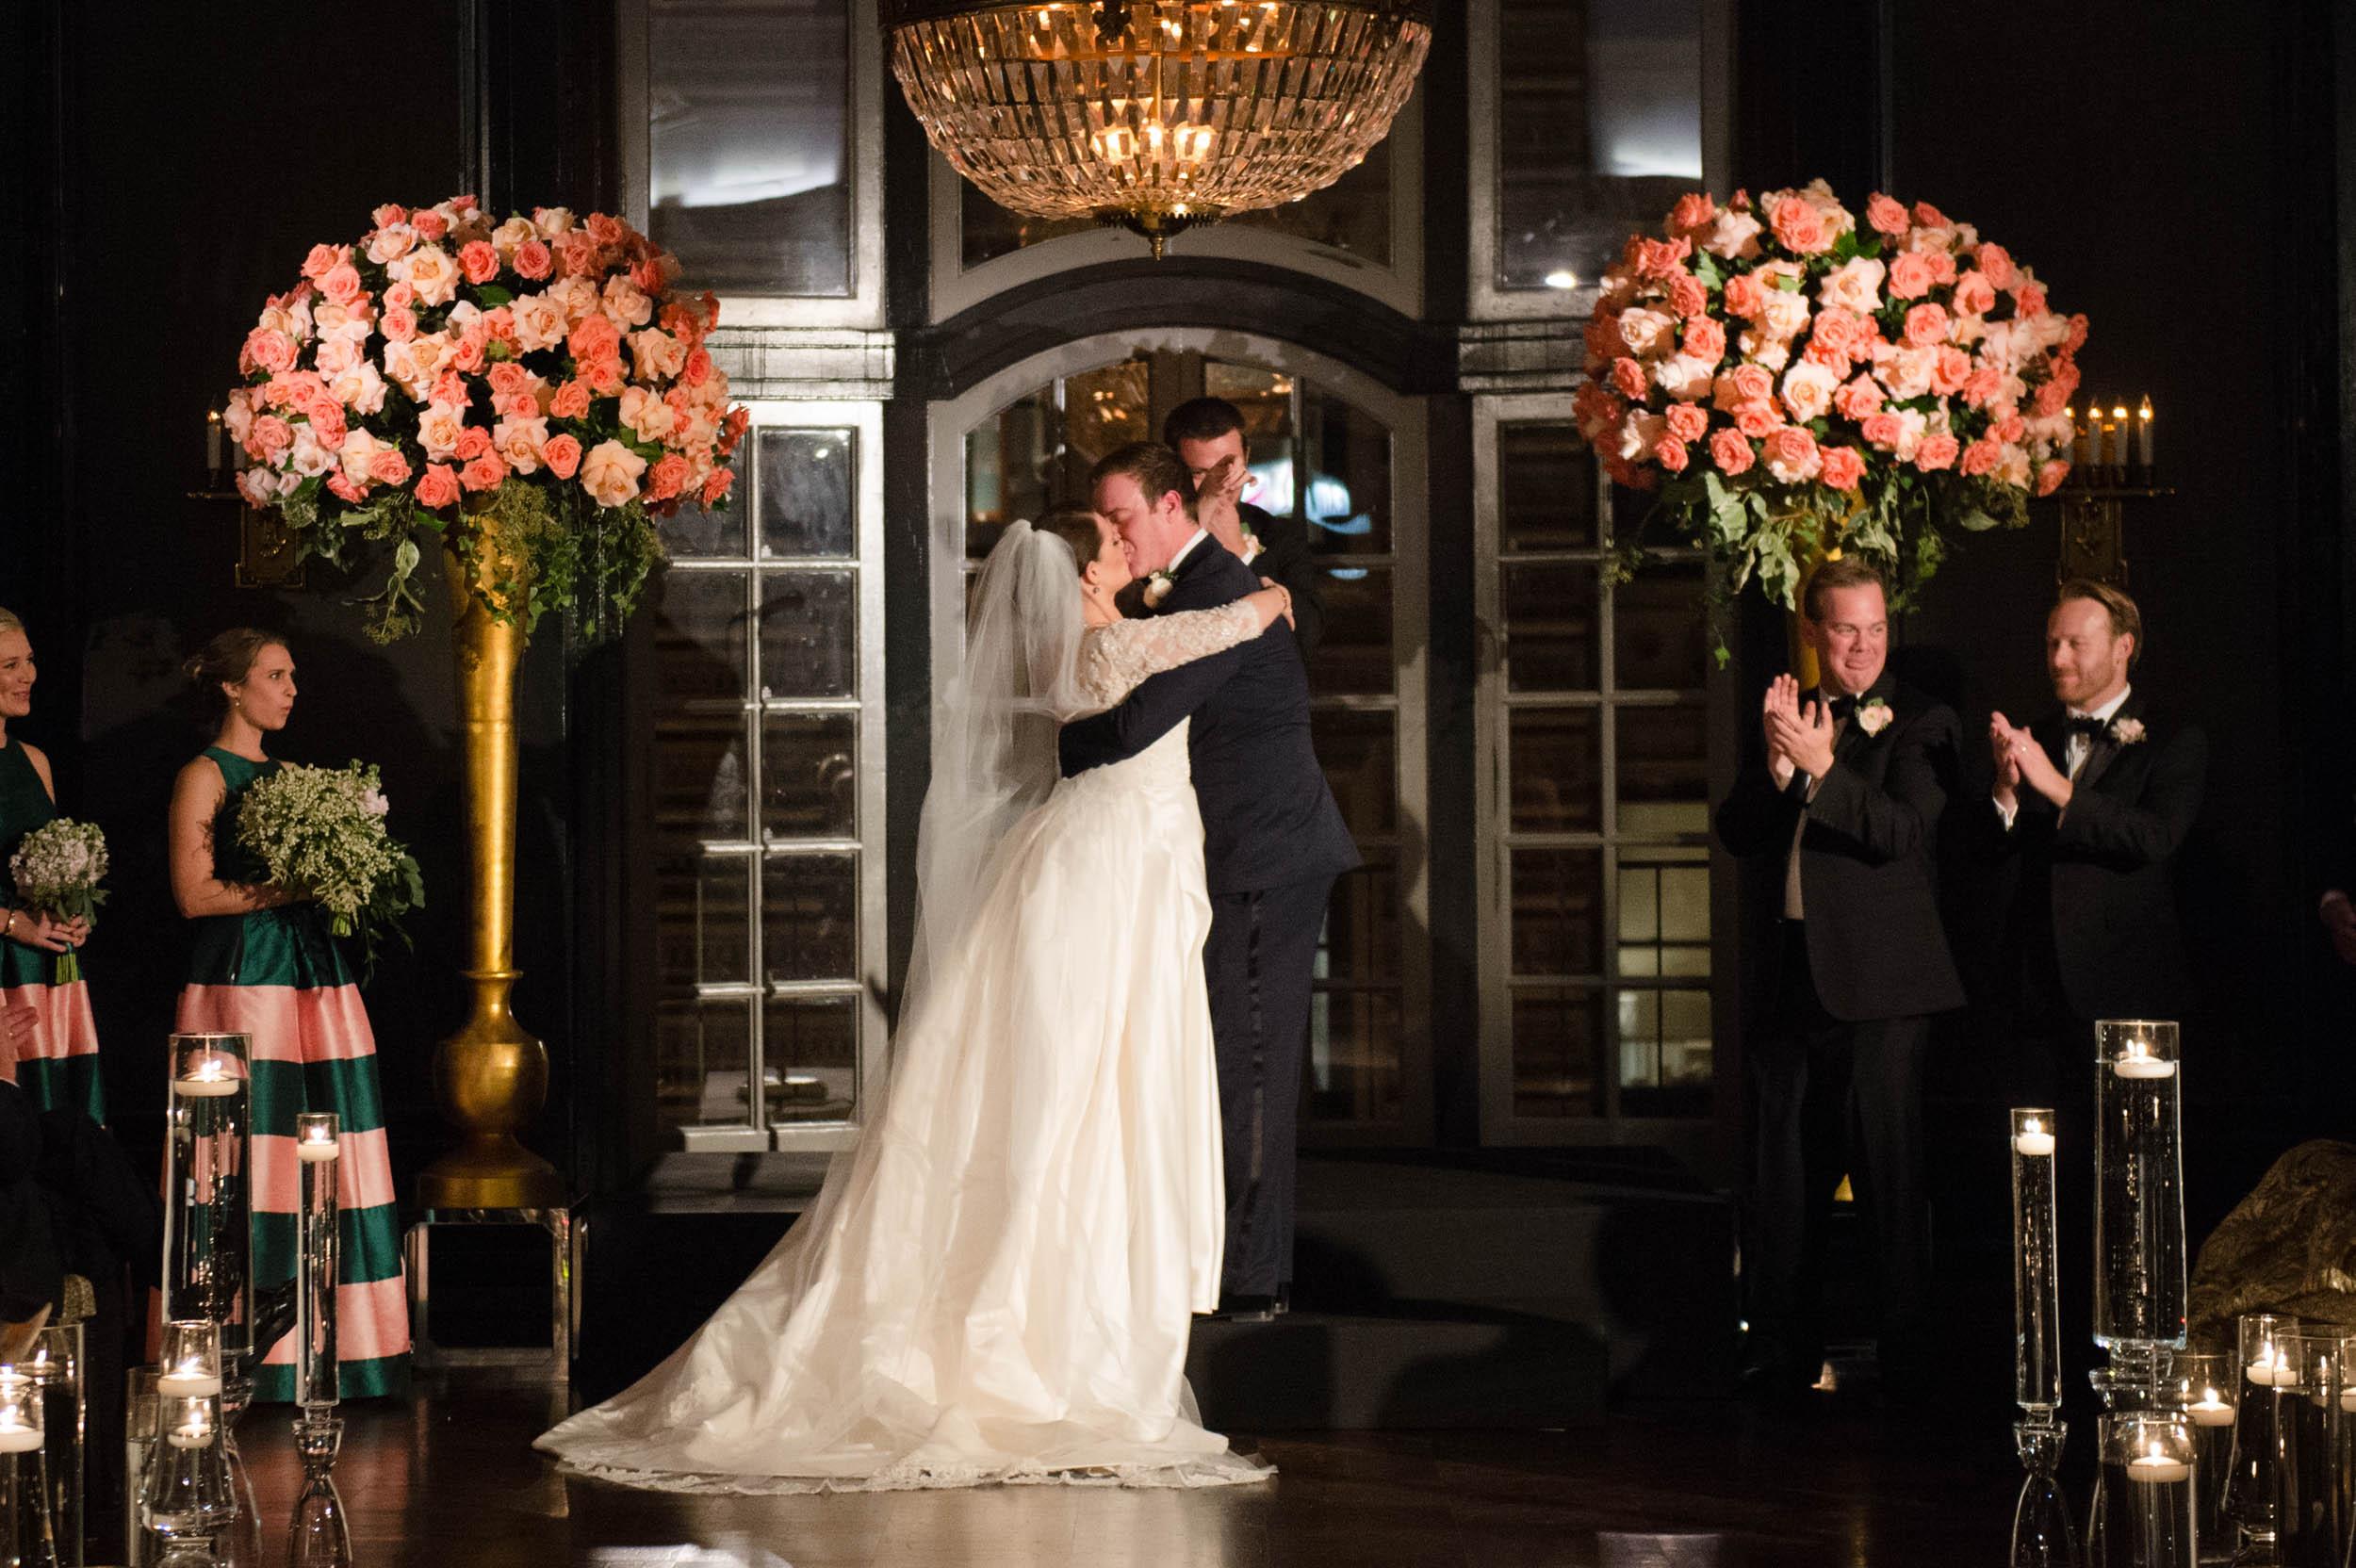 Madison Ballroom wedding ceremony at Chicago Athletic Association